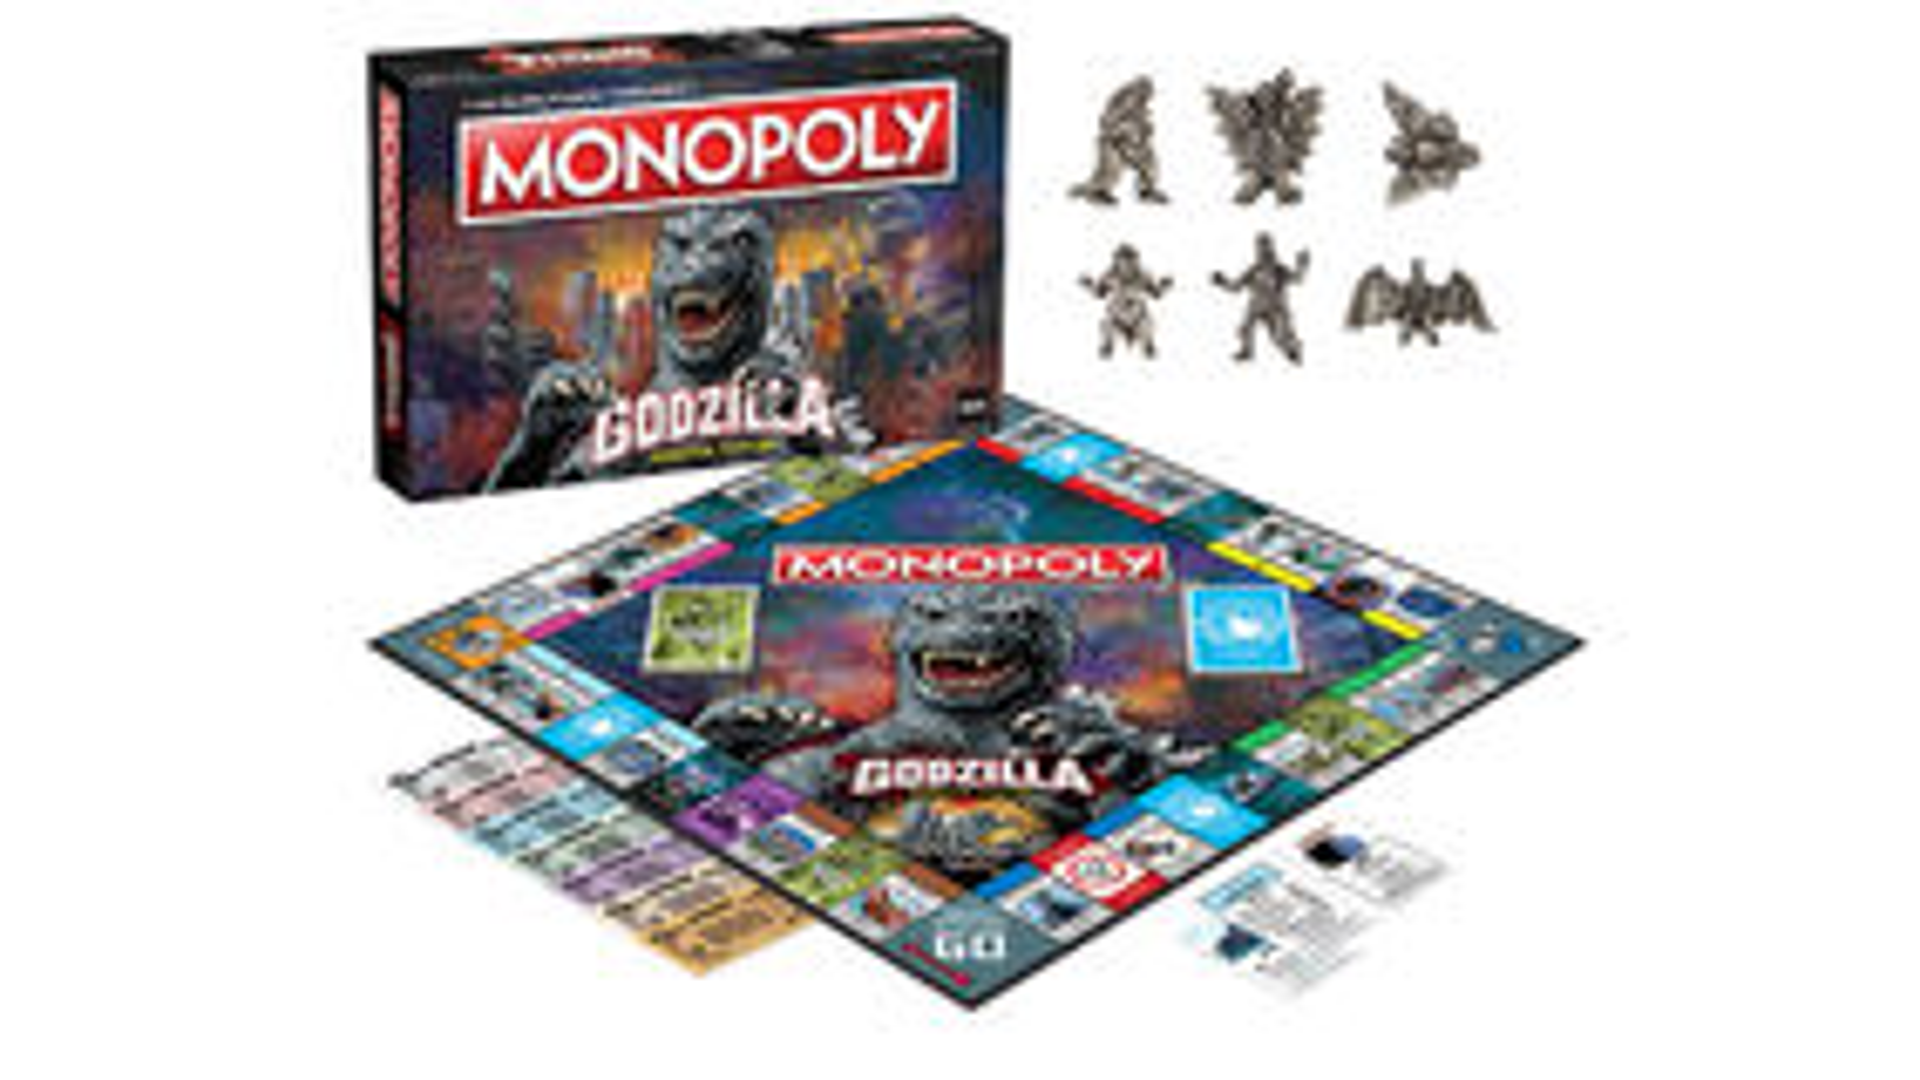 Monopoly: Godzilla Monster Edition board game artwork